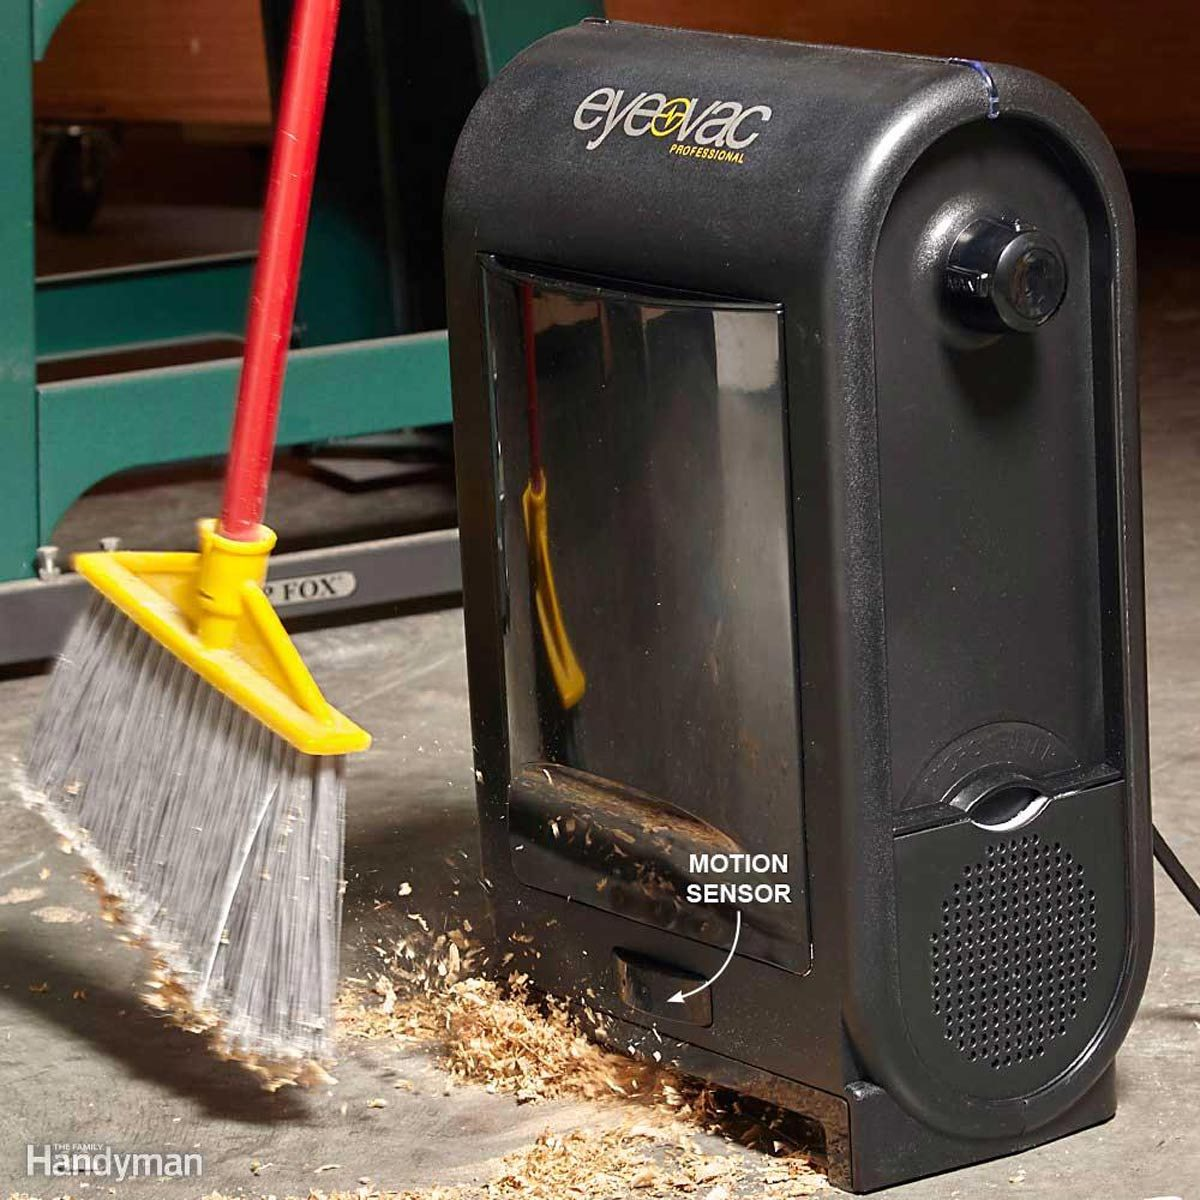 Vacuum Dustpan Saves Your Back